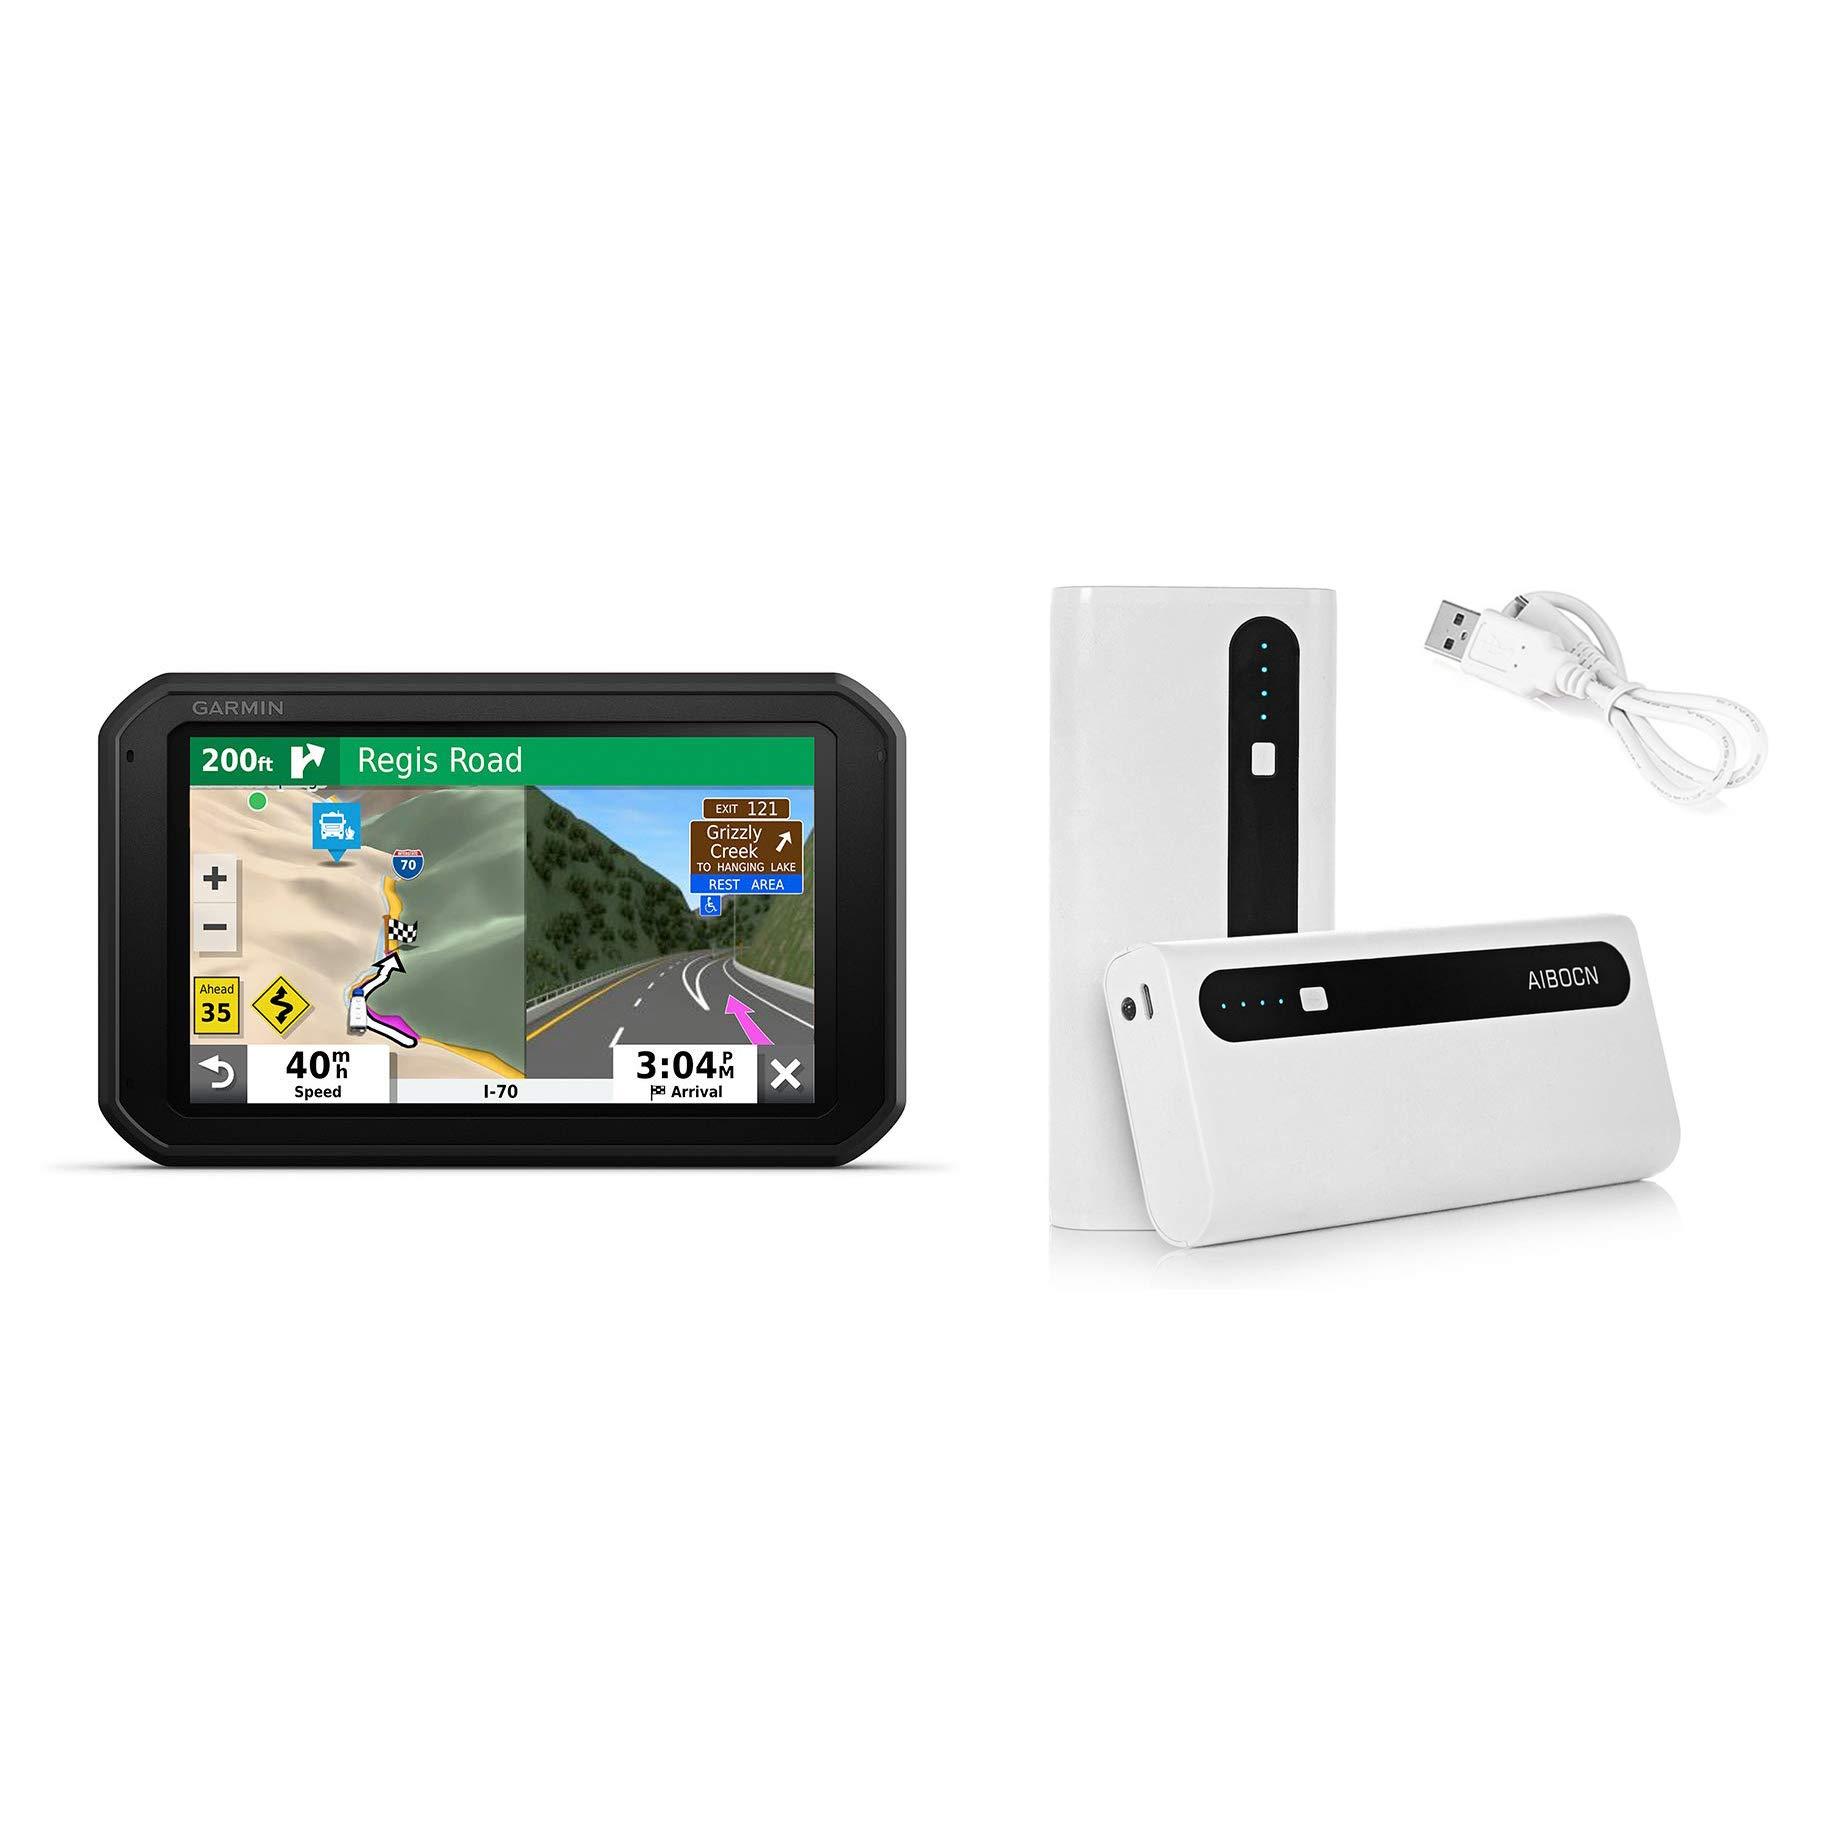 Garmin RV 785 & Traffic, Advanced GPS Navigator for RVs 010-02228-00 and Aibocn 10,000mAh Portable Battery Charger Bundle by GPS City